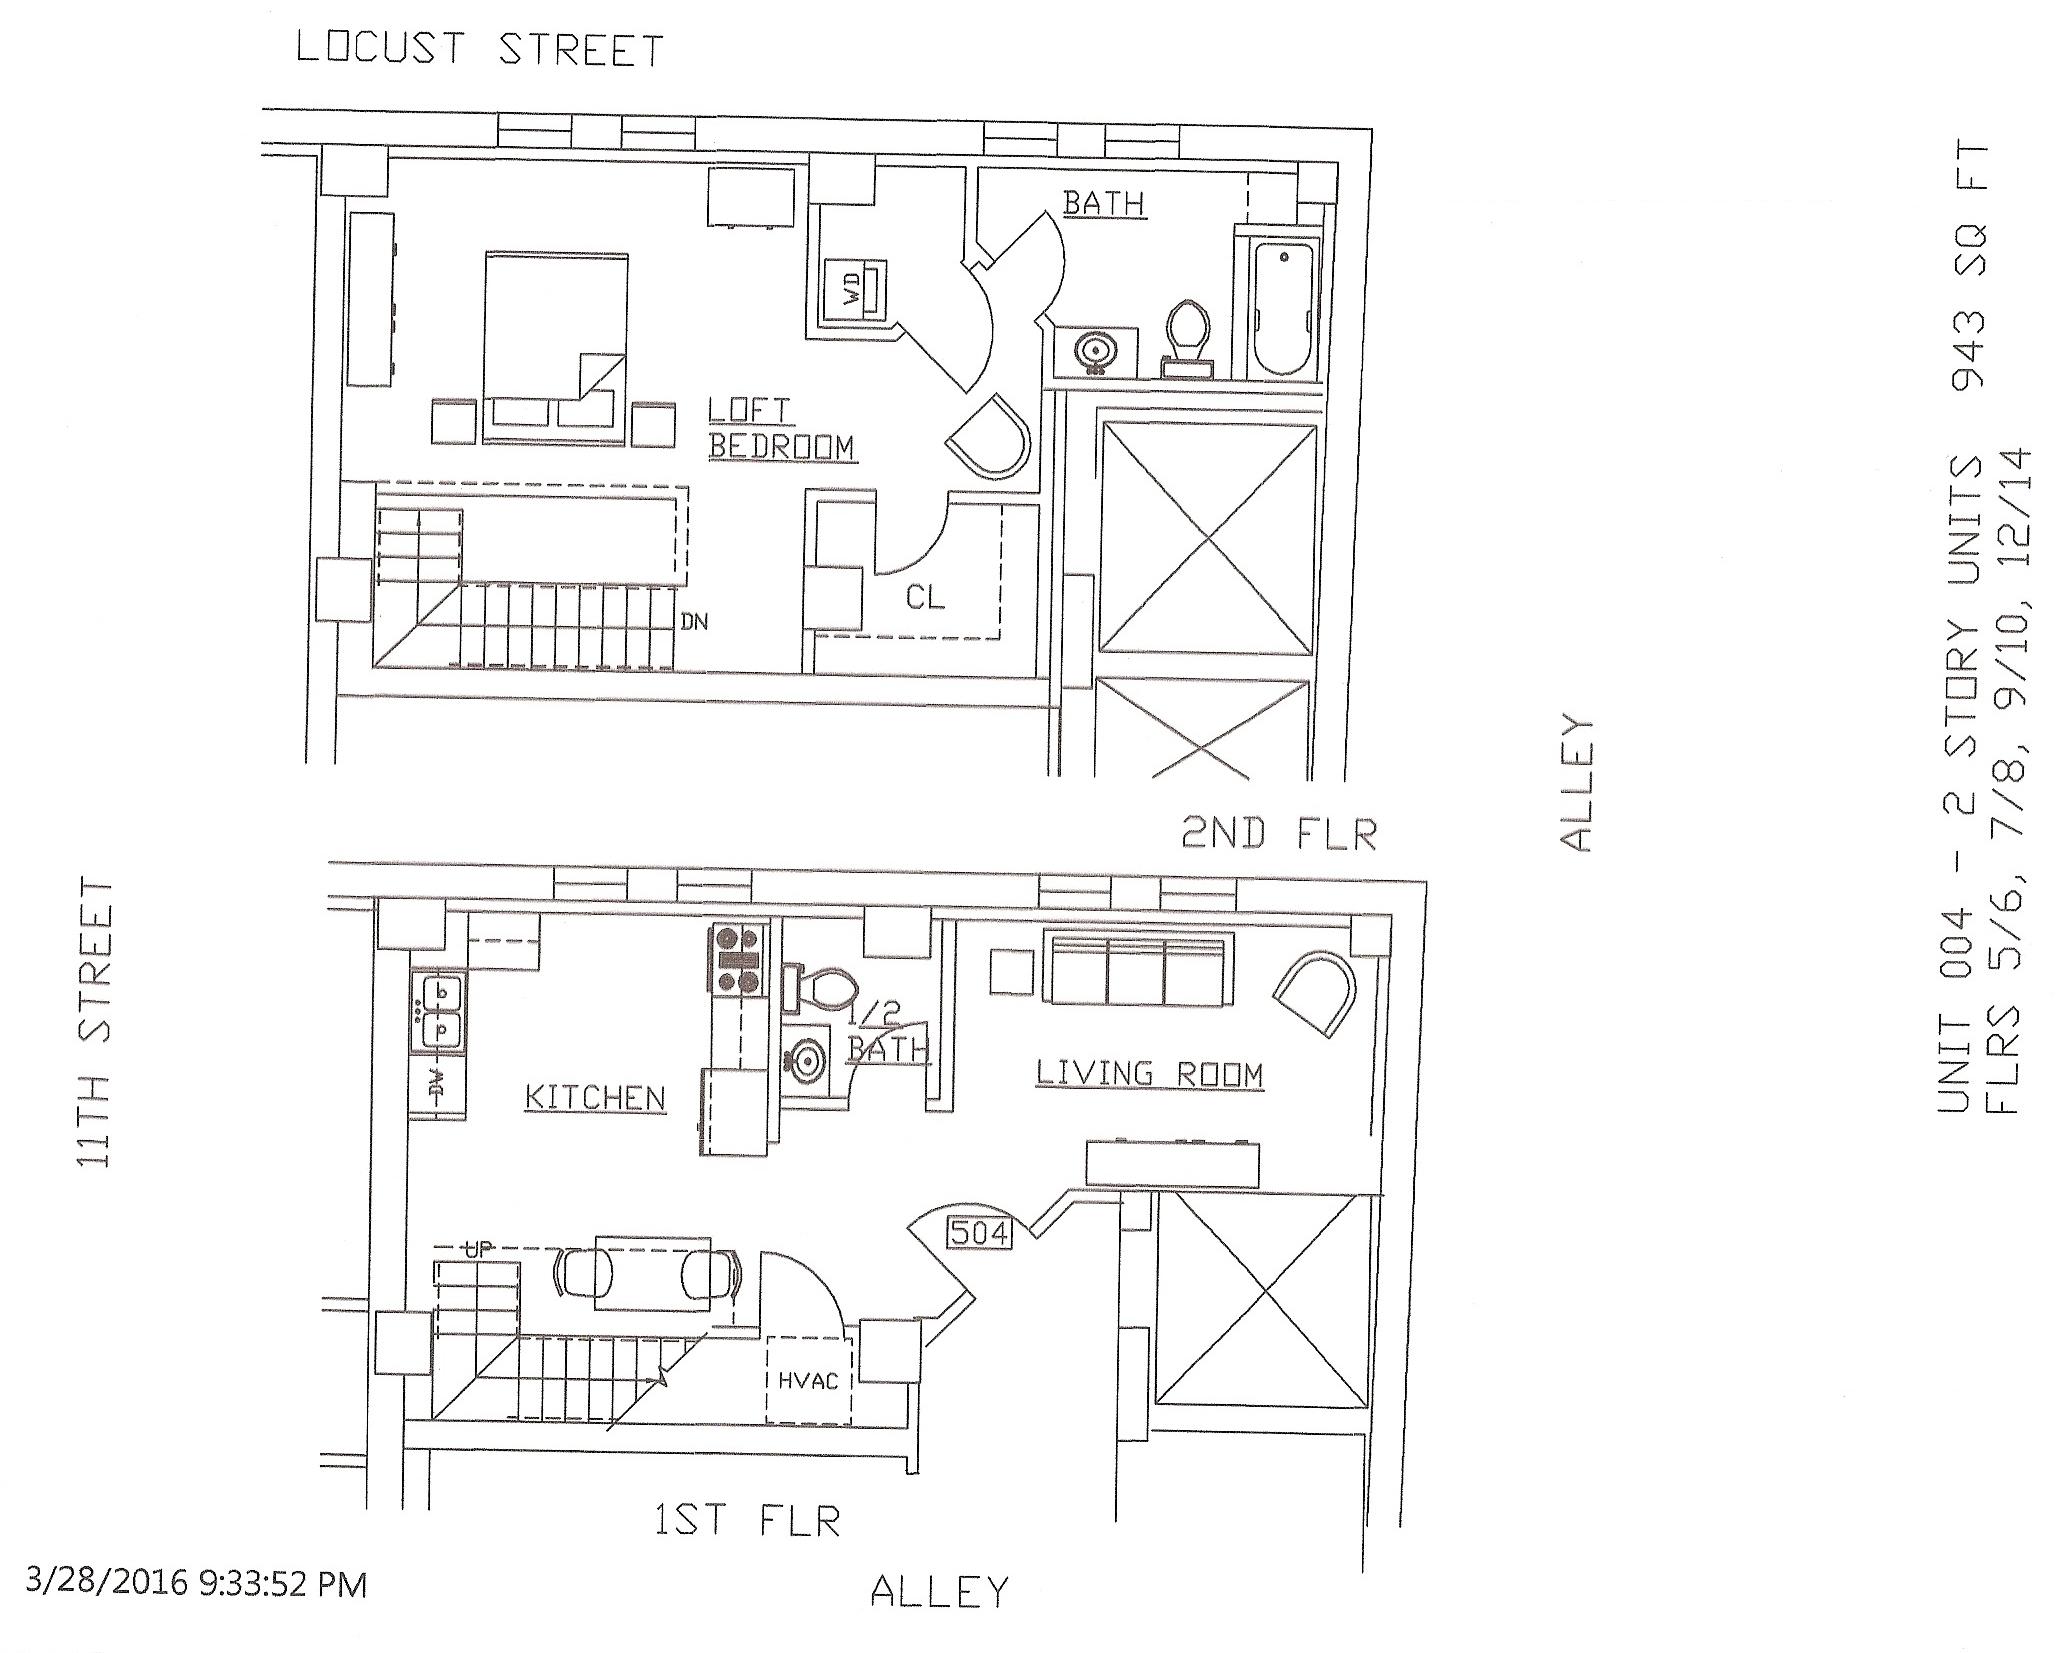 Unit 04, 943 Square Feet